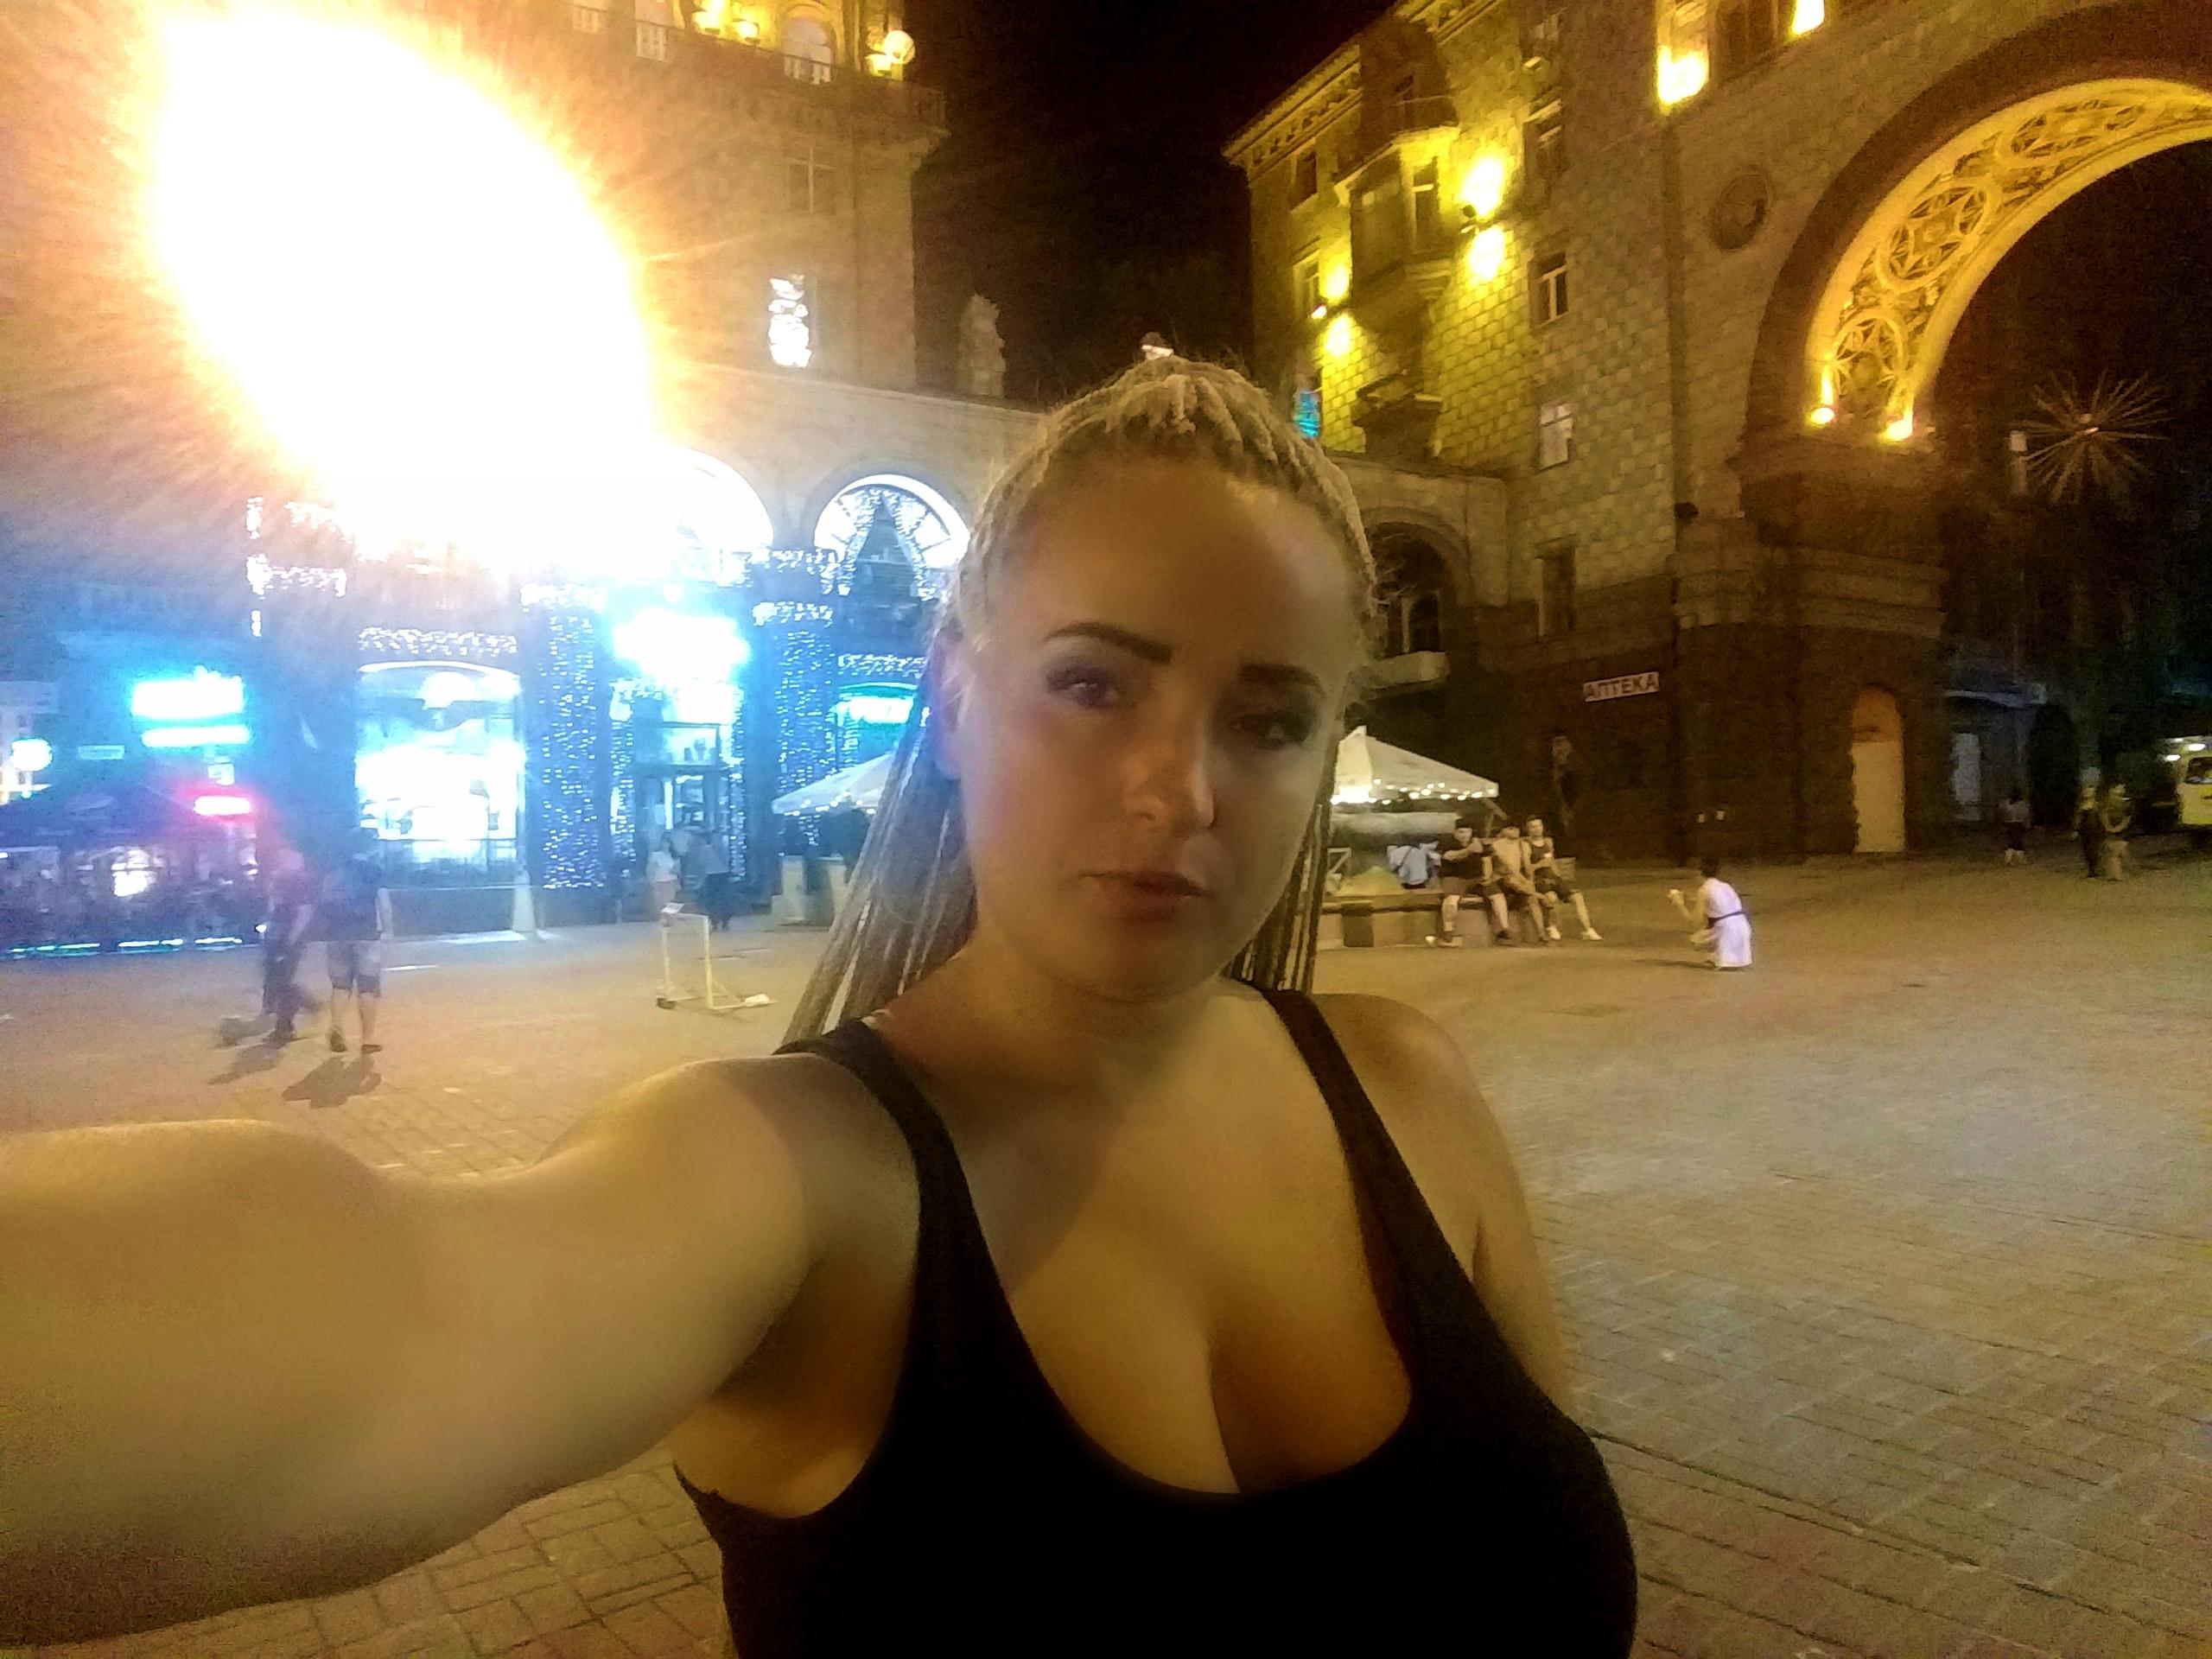 Елена Руденко (Валтея). Украина. Киев. Фото и описание.  K9fFEdBeKSw